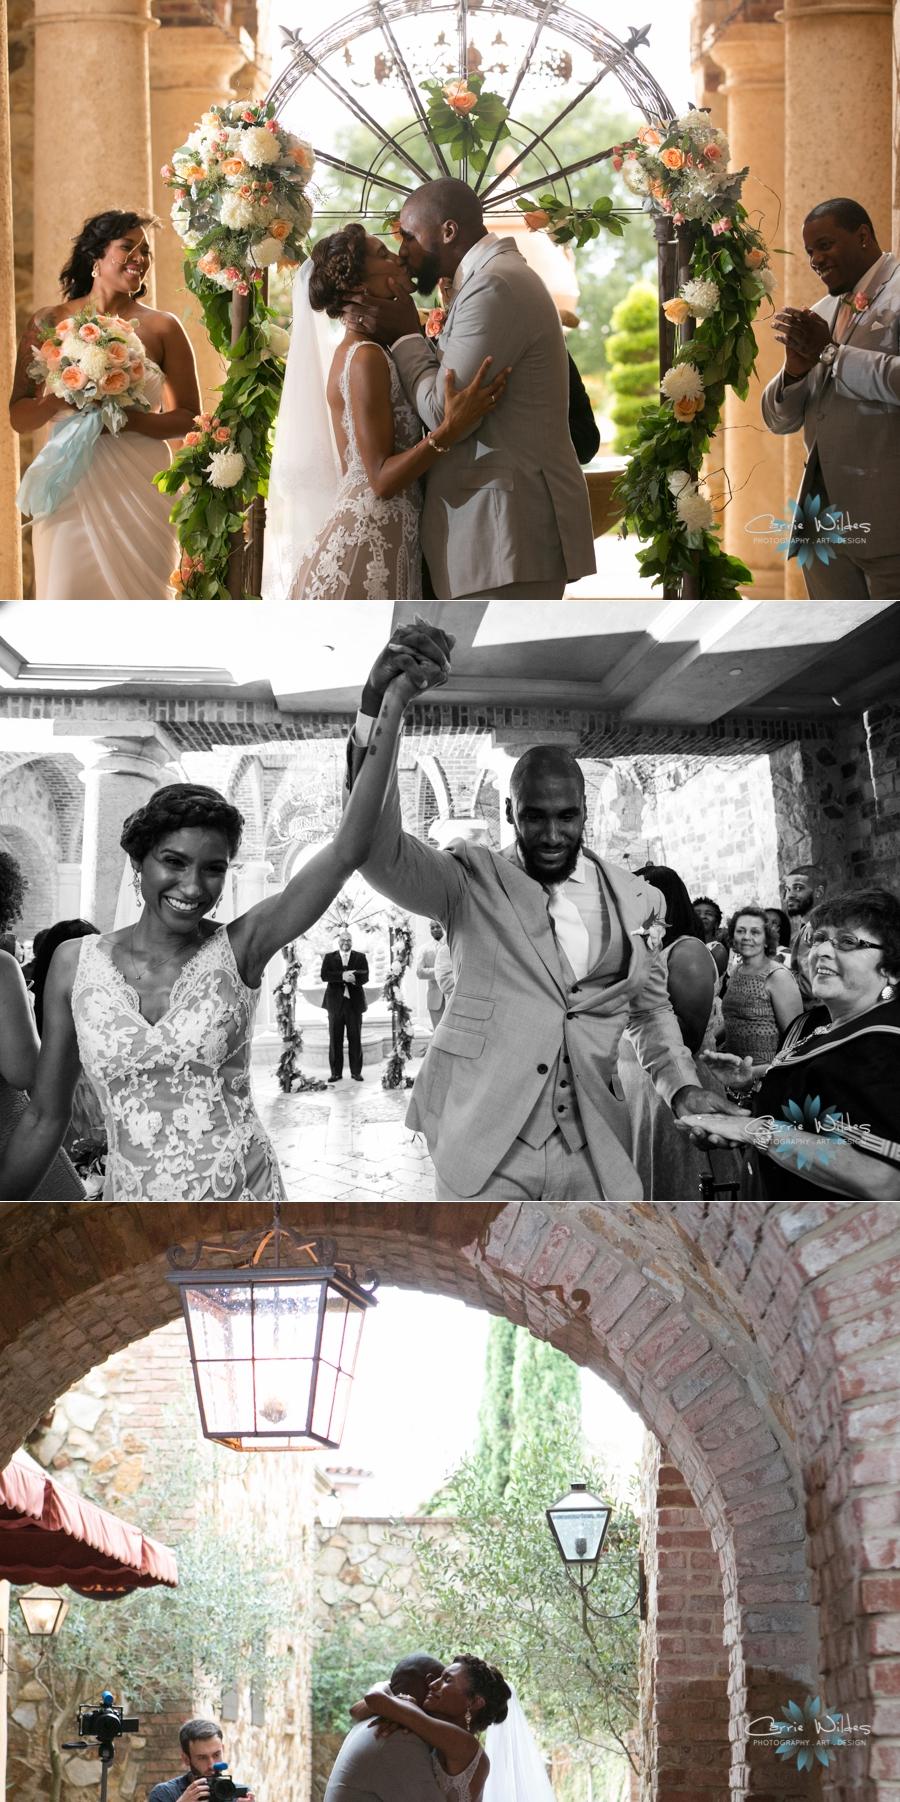 8_14_15 Bella Collina Wedding_0028.jpg